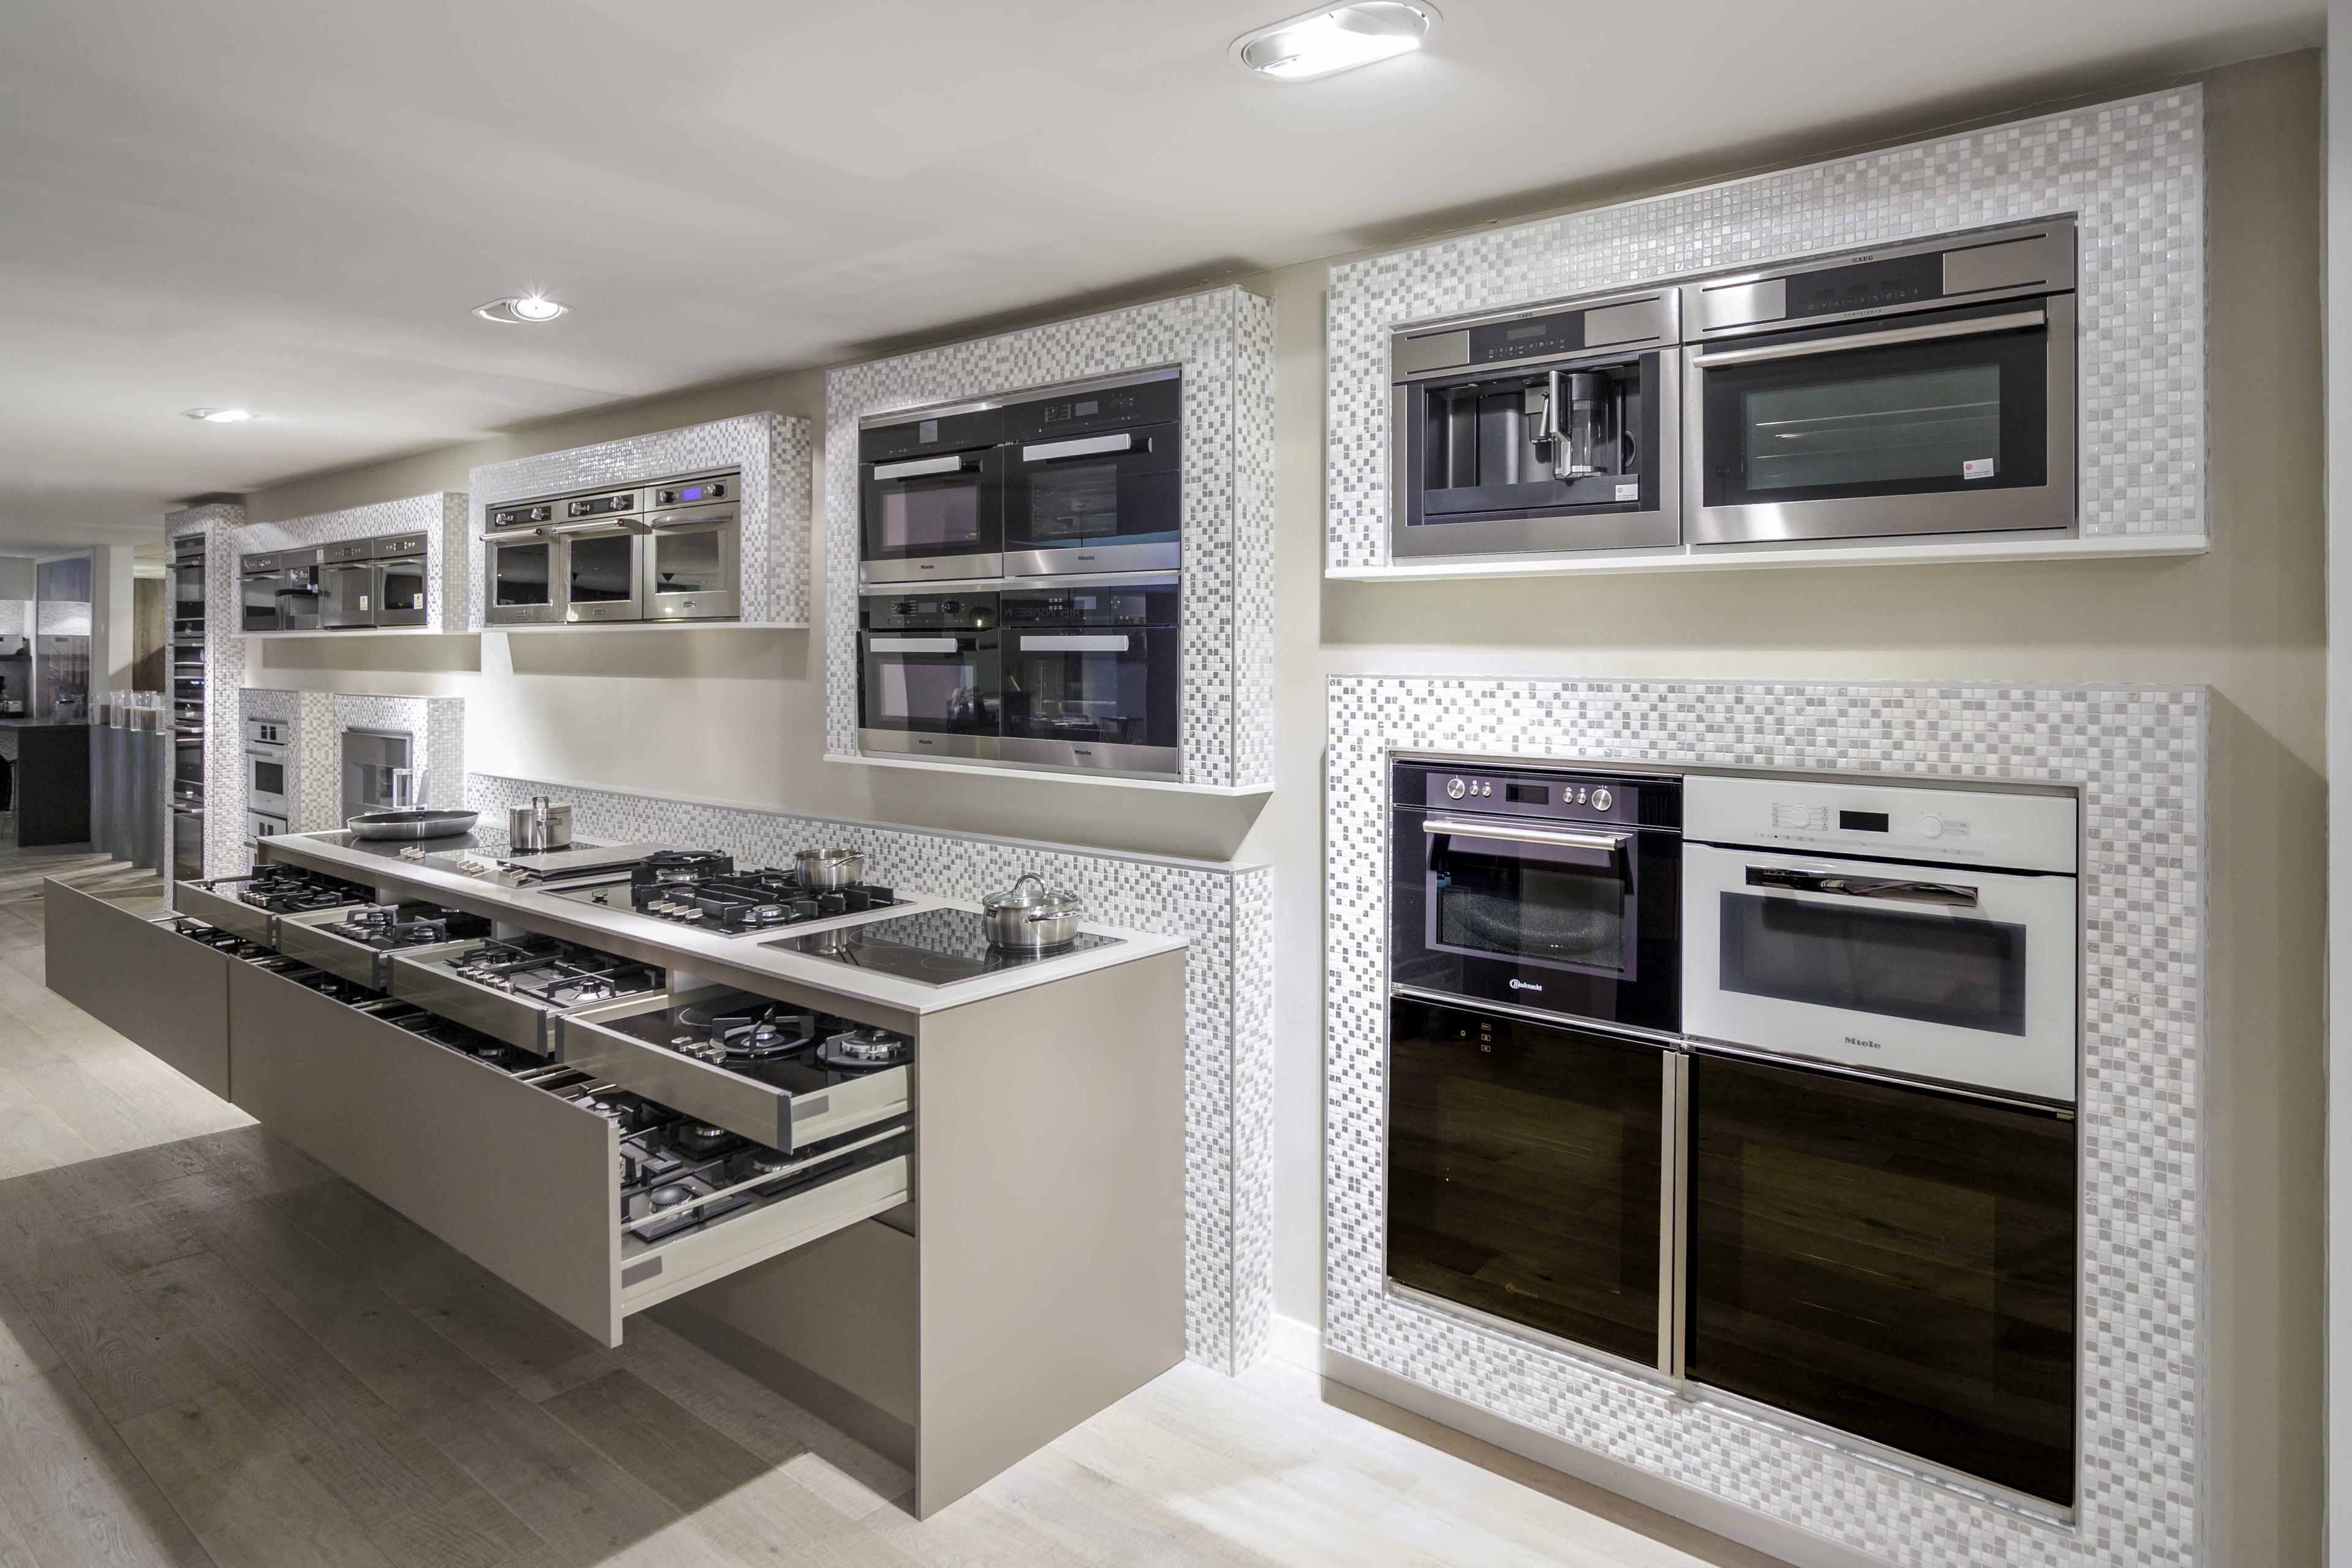 Exclusieve keukens barletti